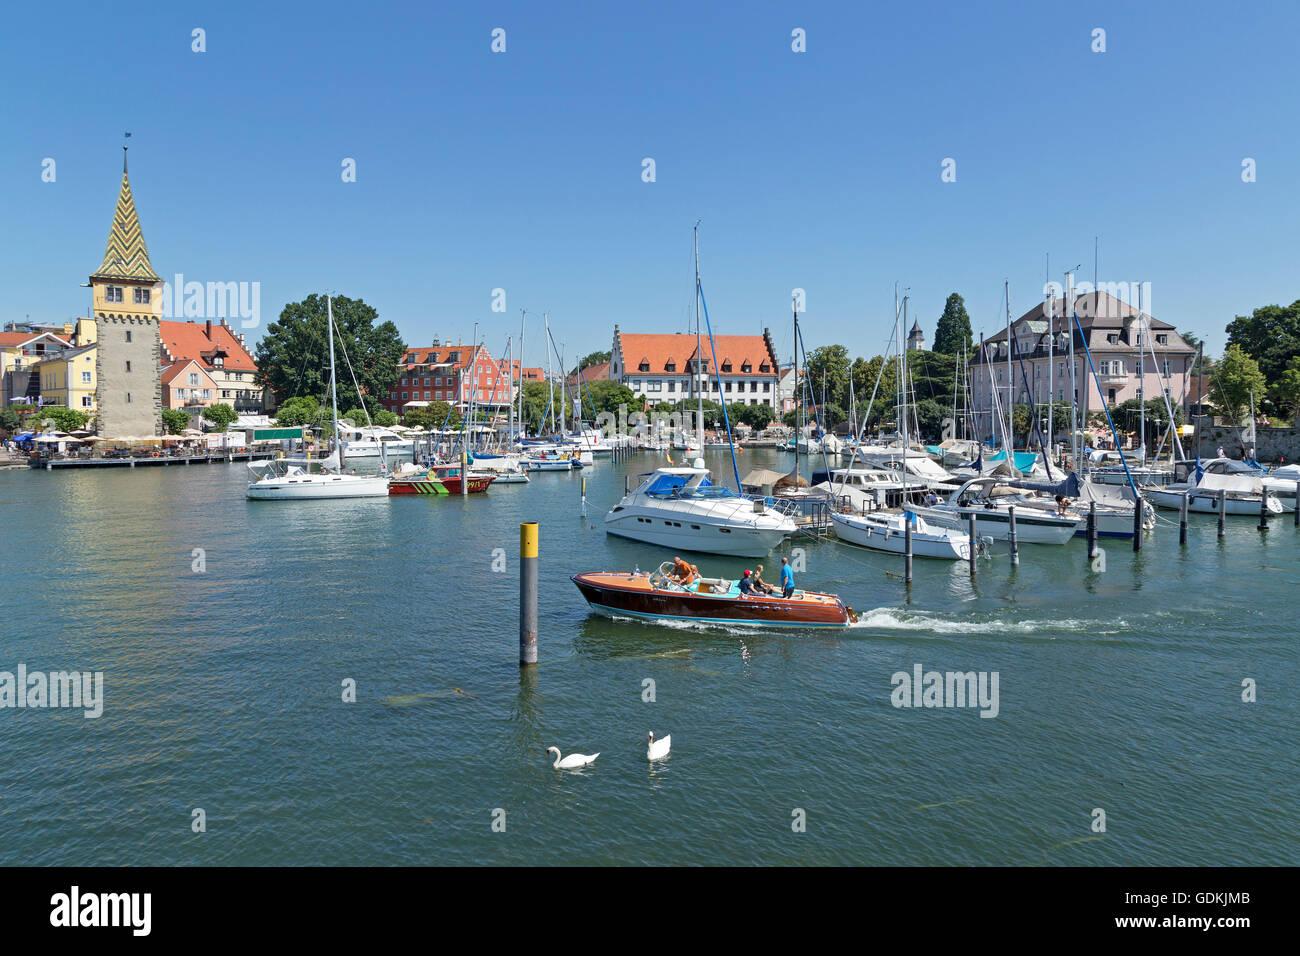 harbour with Mangenturm, Lindau, Lake Constance, Bavaria, Germany Stock Photo